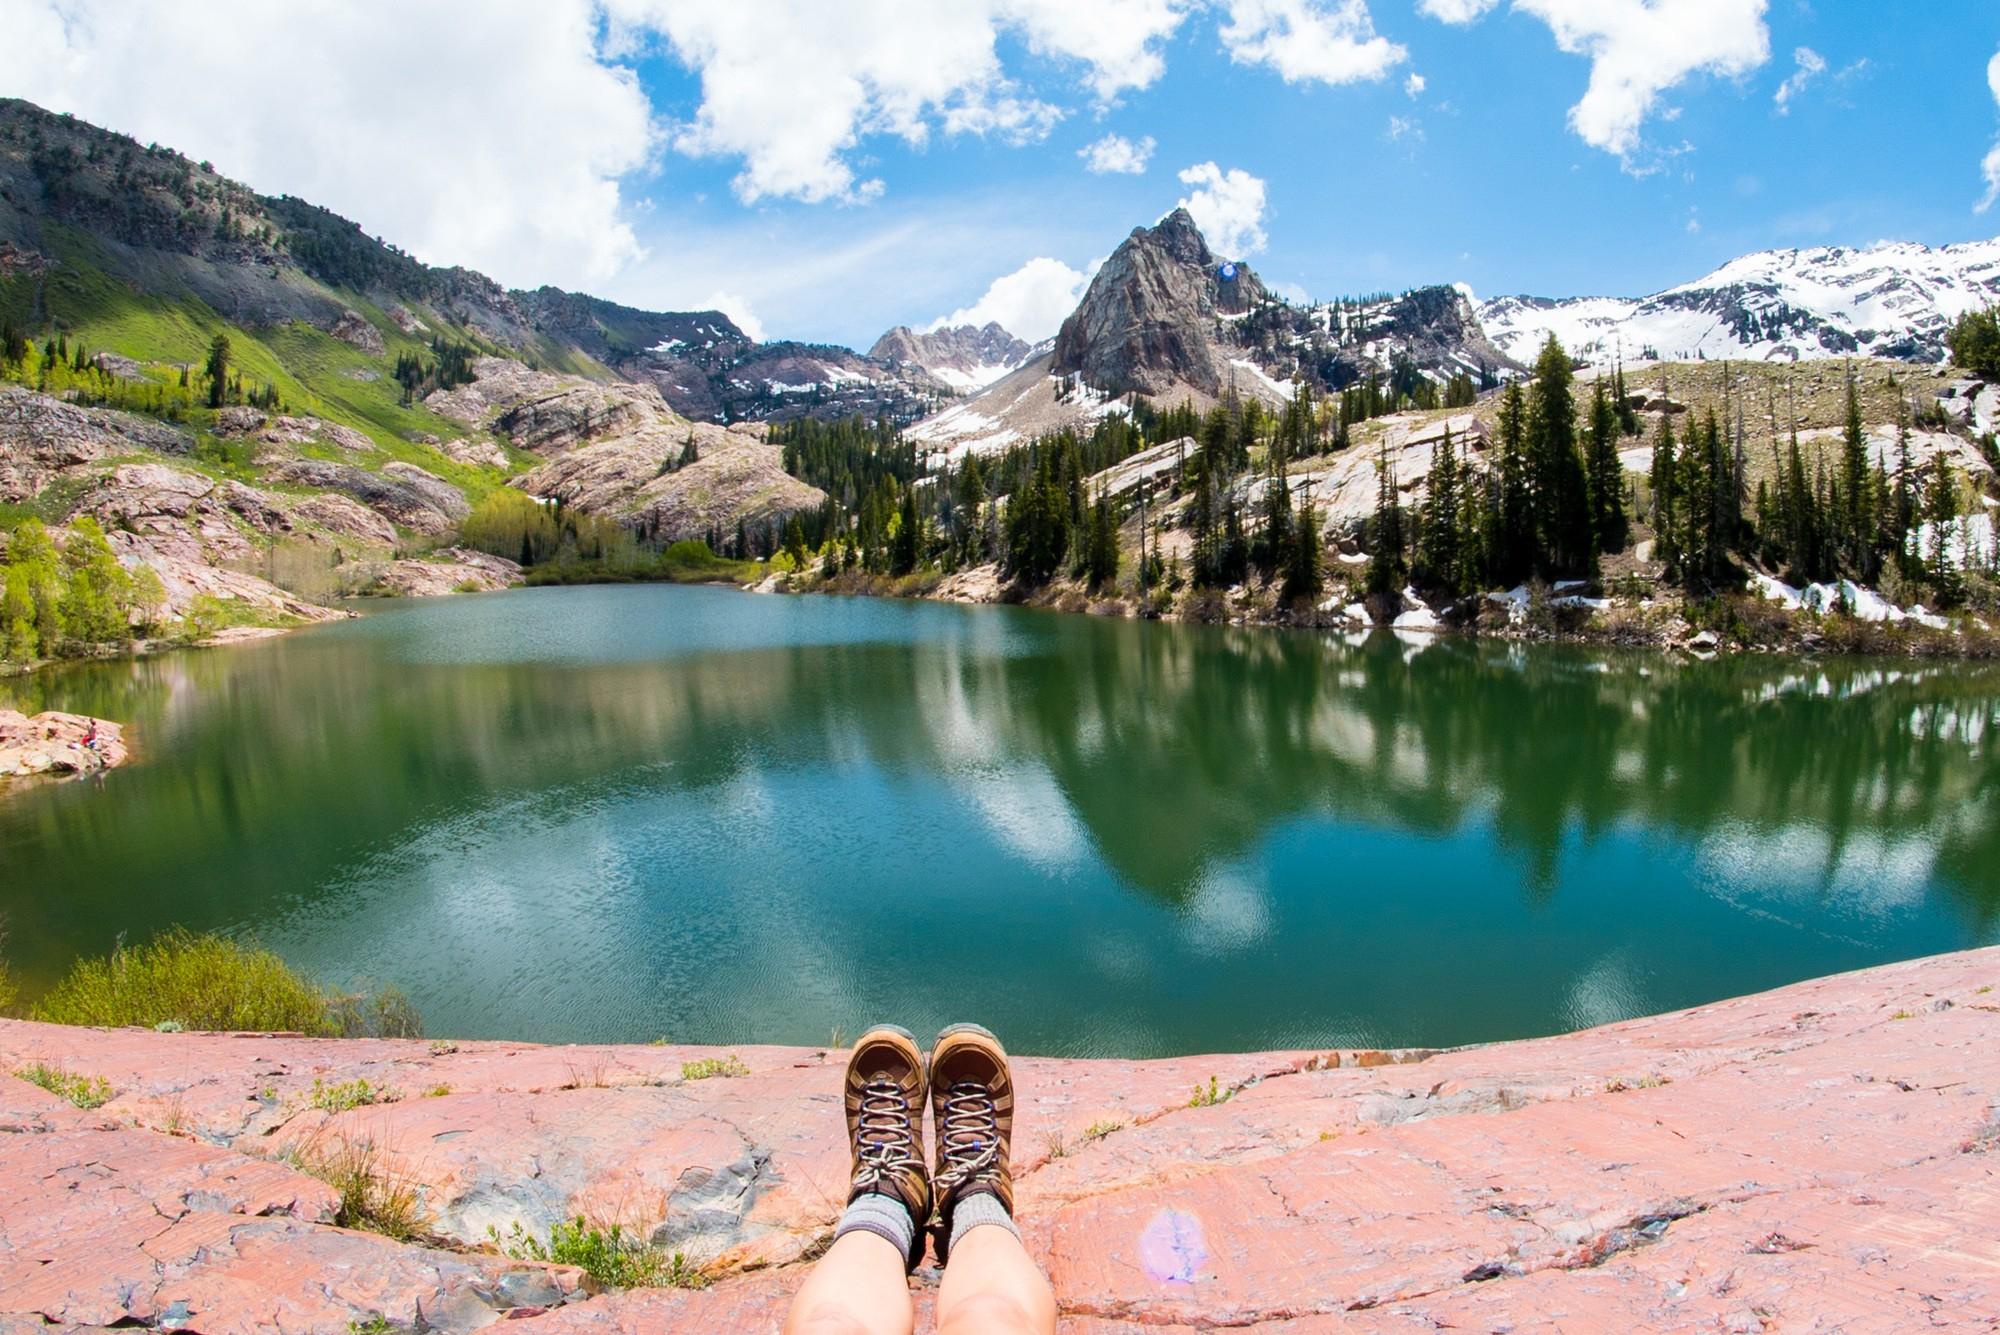 Hike to somewhere